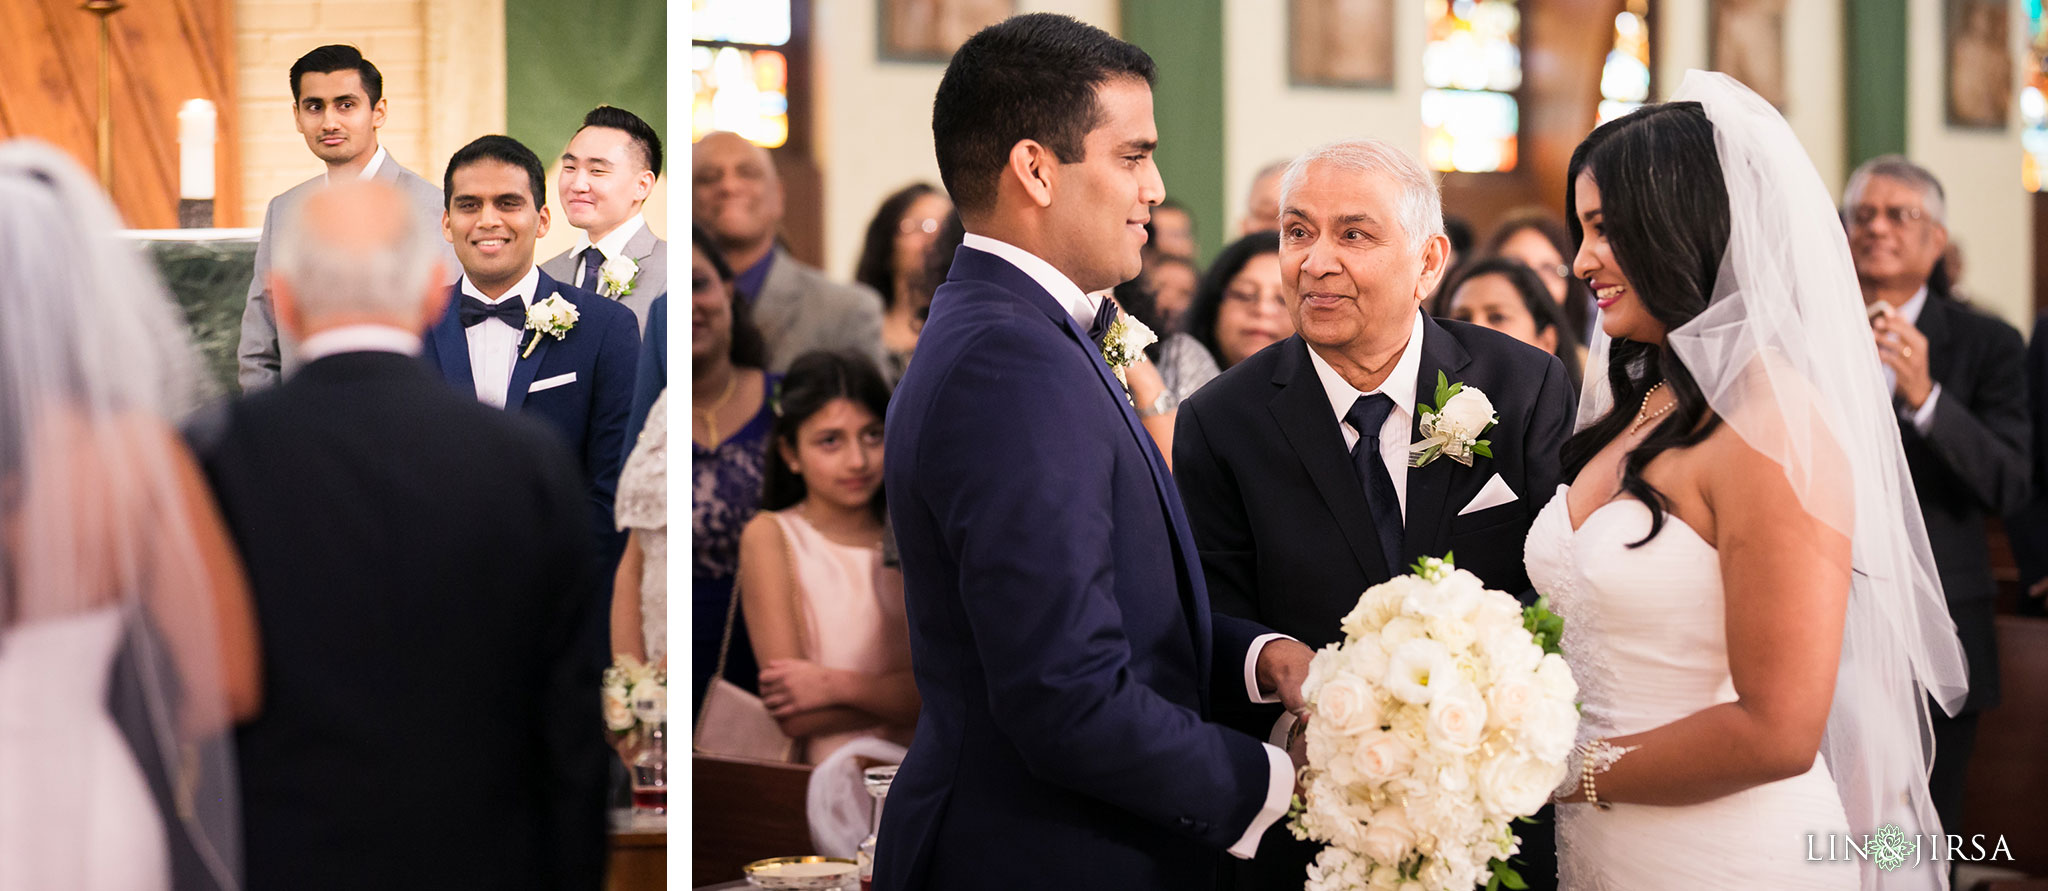 15 St Juliana Falconieri Church Fullerton Wedding Photography